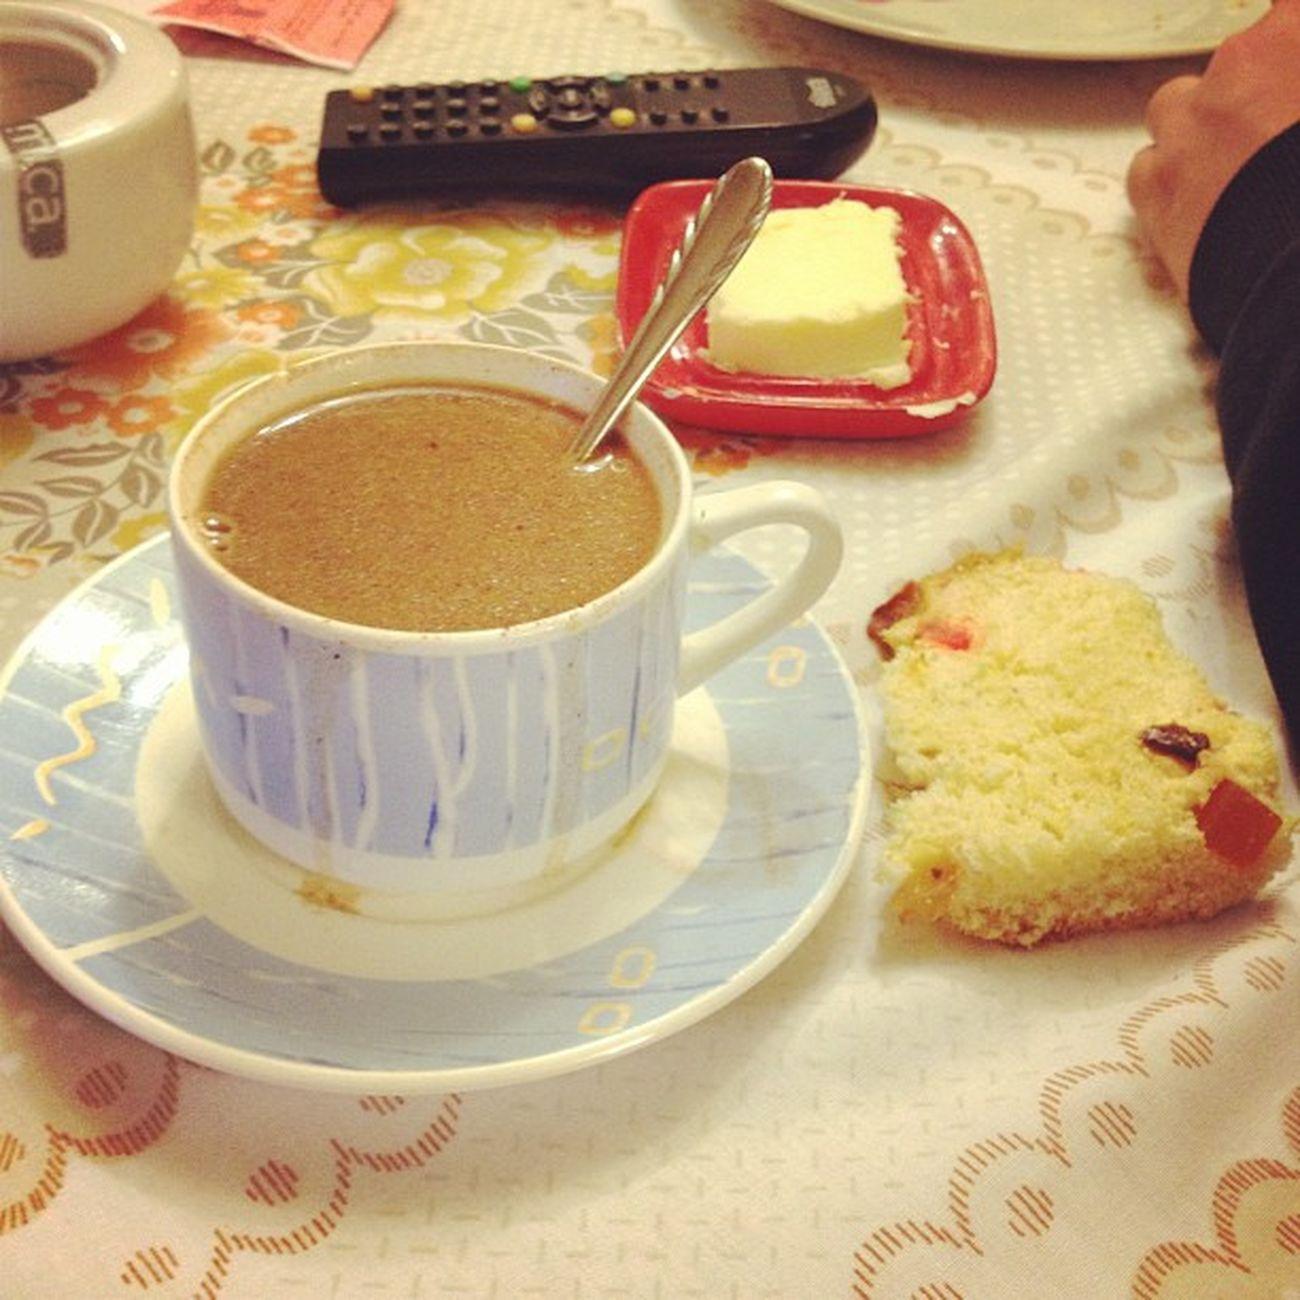 Lahoradellonchecito con la tipica celebracion por Fiestaspatrias 29julio Paneton chocolate igersperu instagramperu